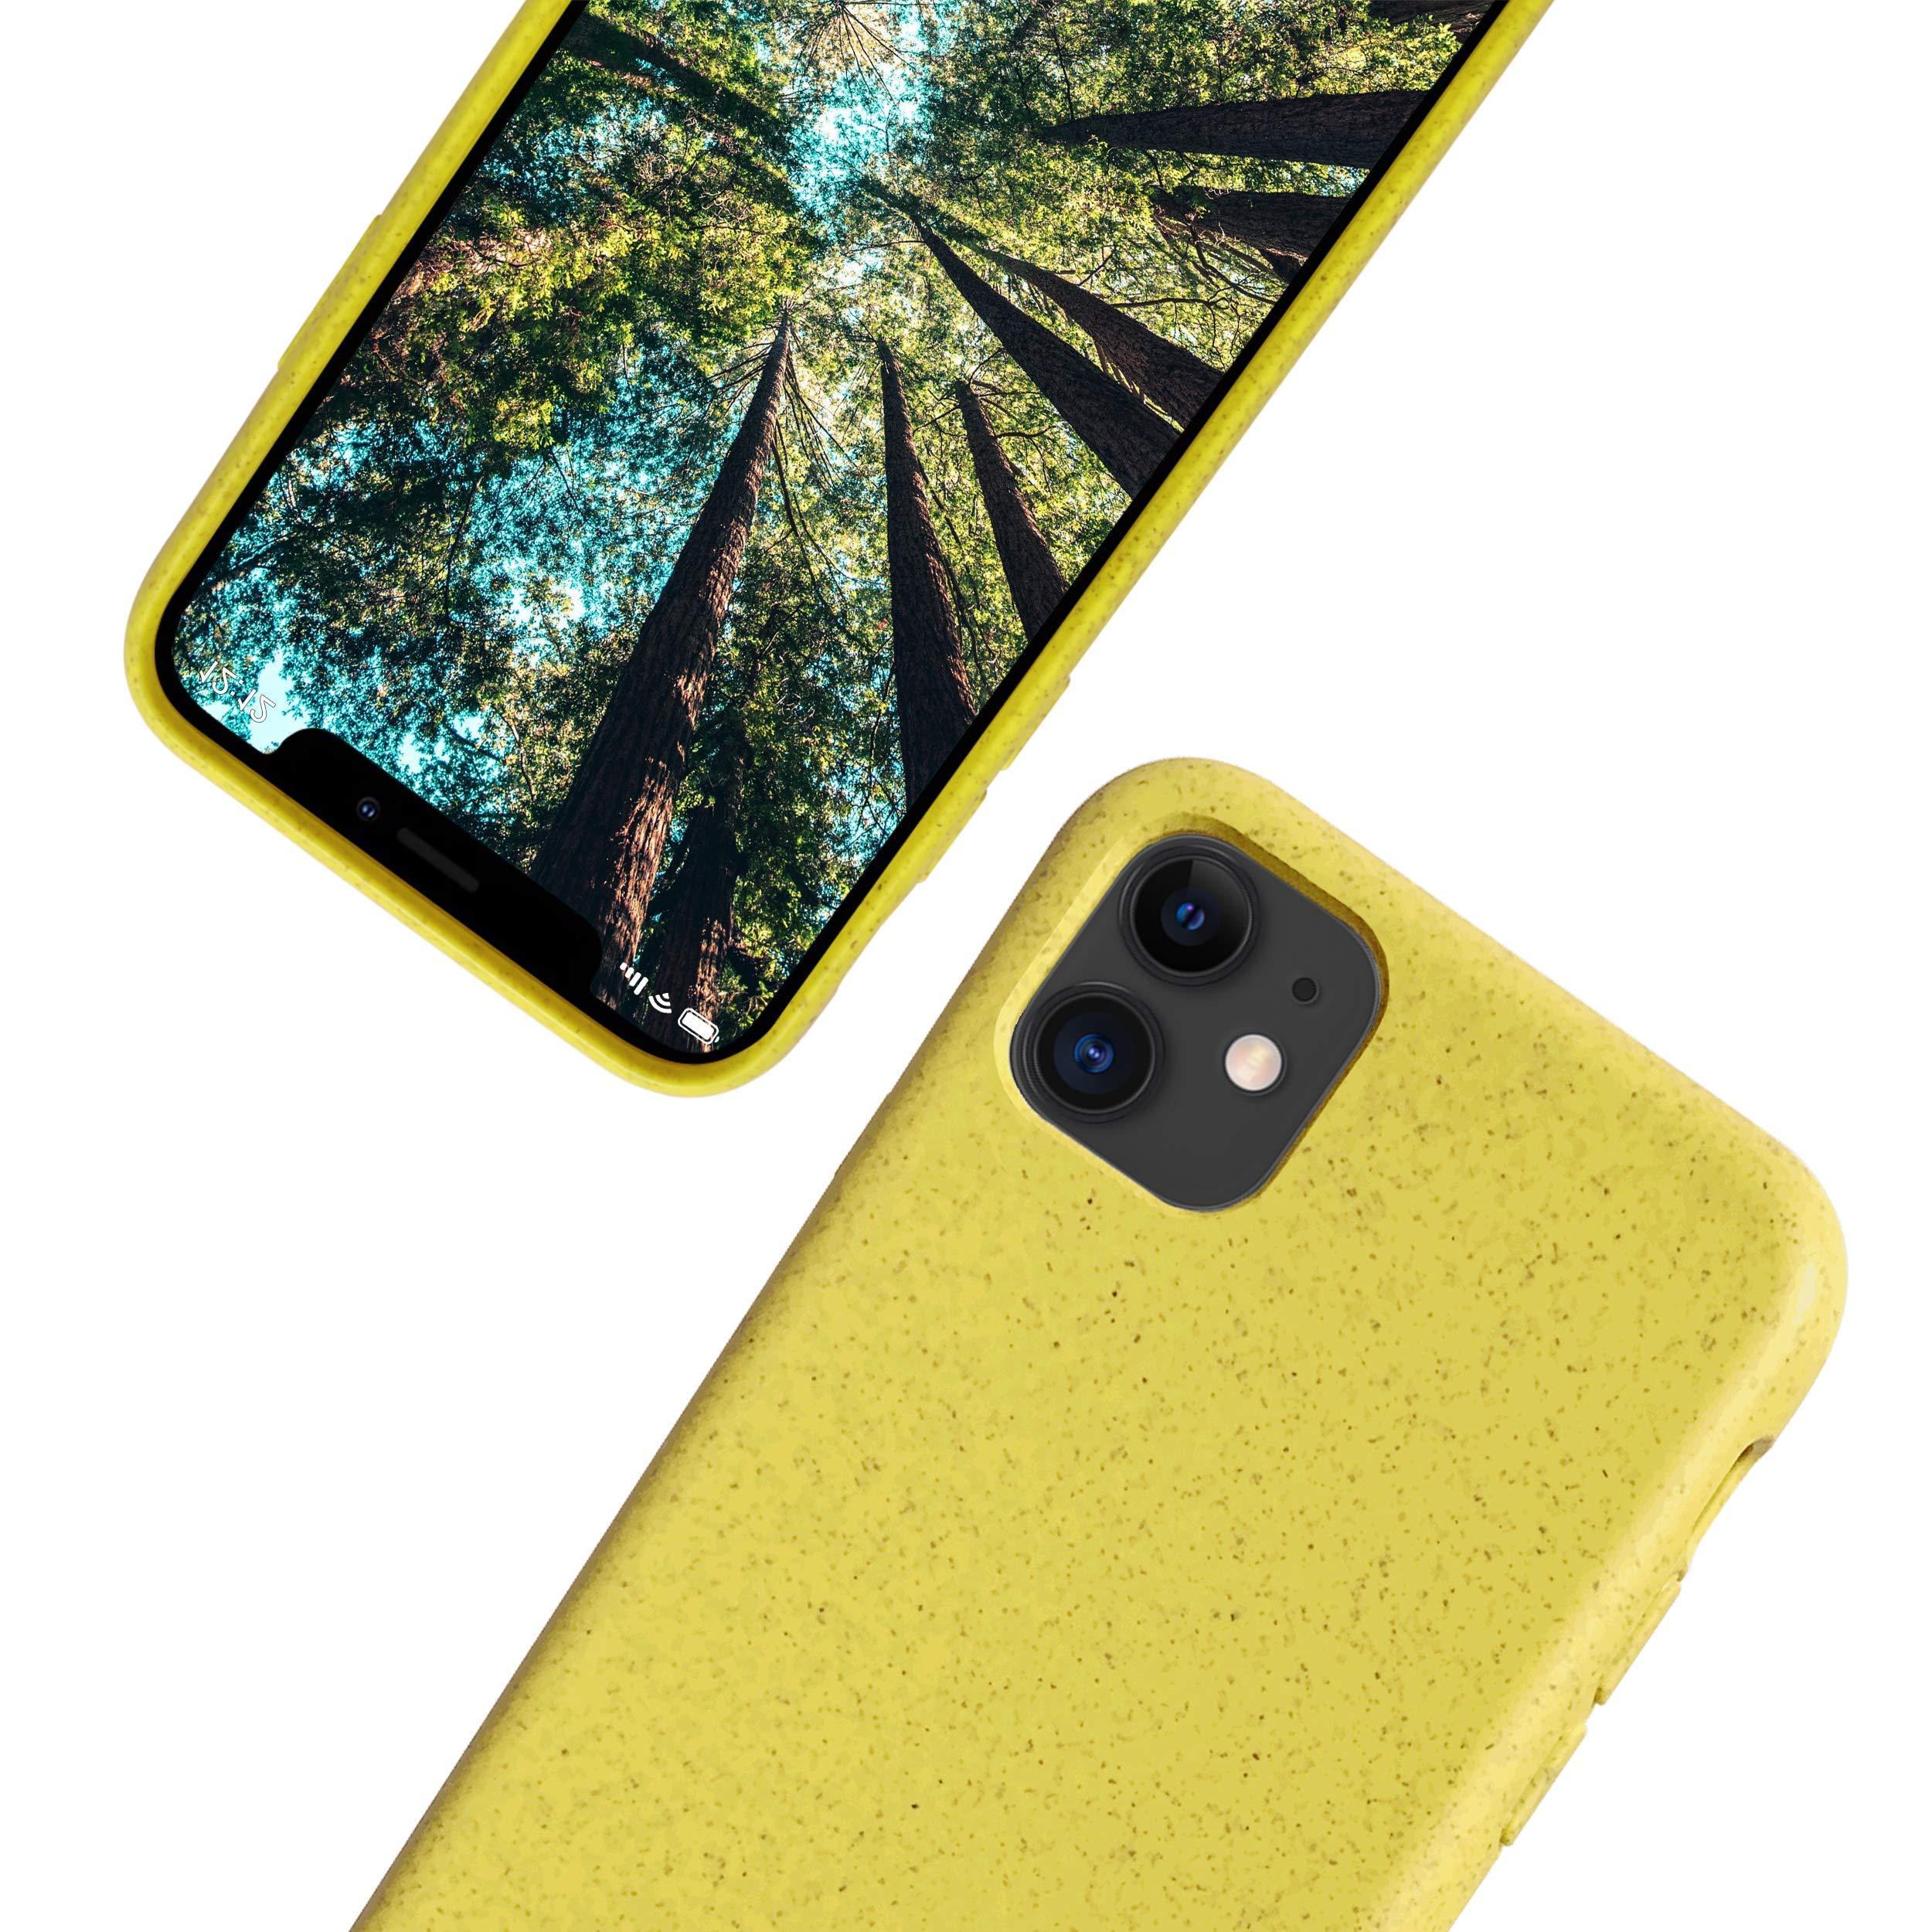 eplanita Eco Funda para iPhone 11/11 Pro, Biodegradable y ...